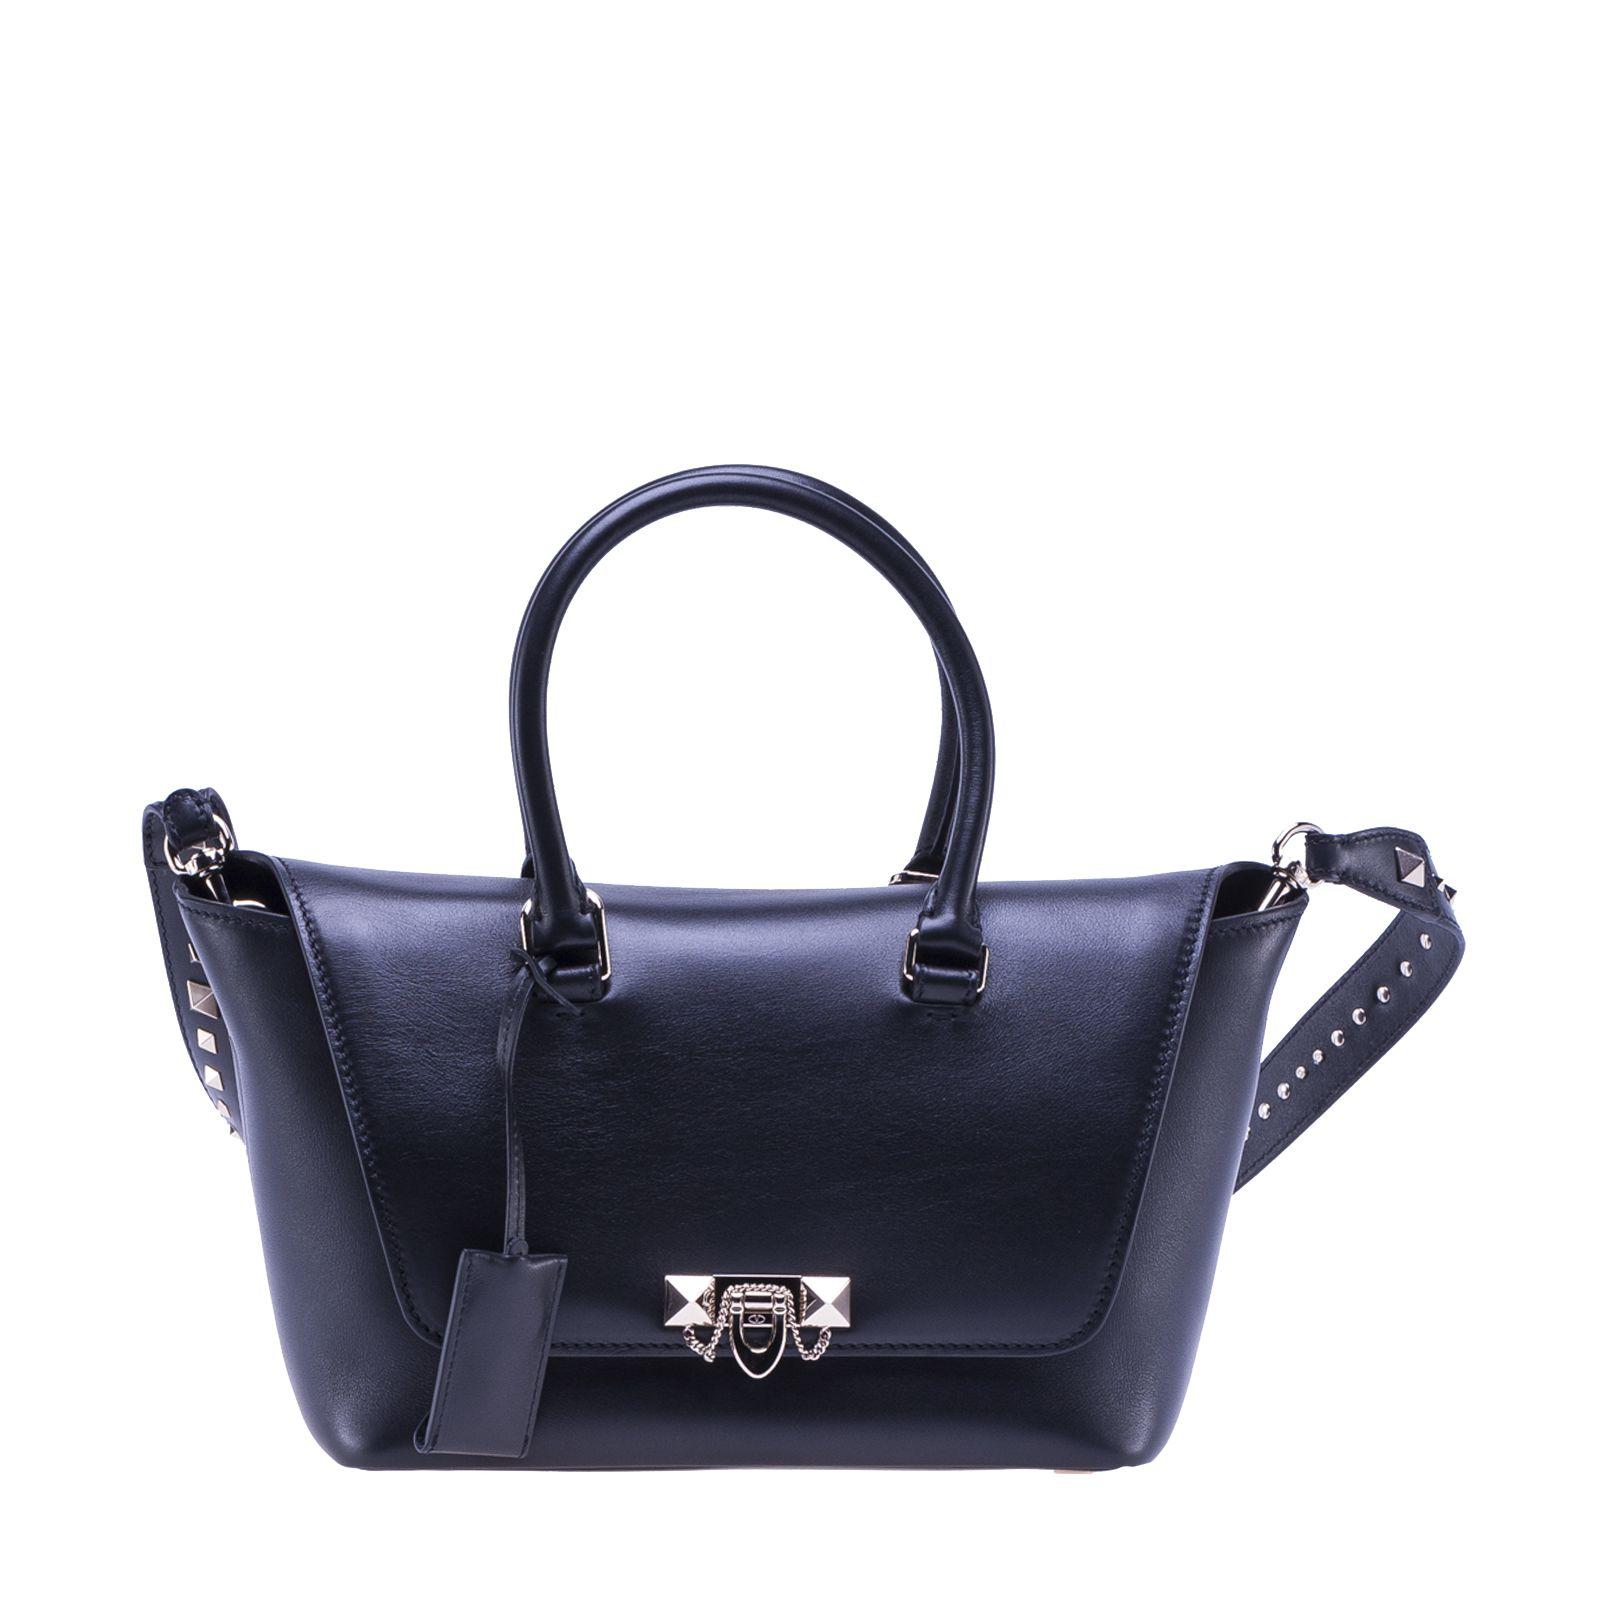 Valentino Demi Lune Shoulder Bag